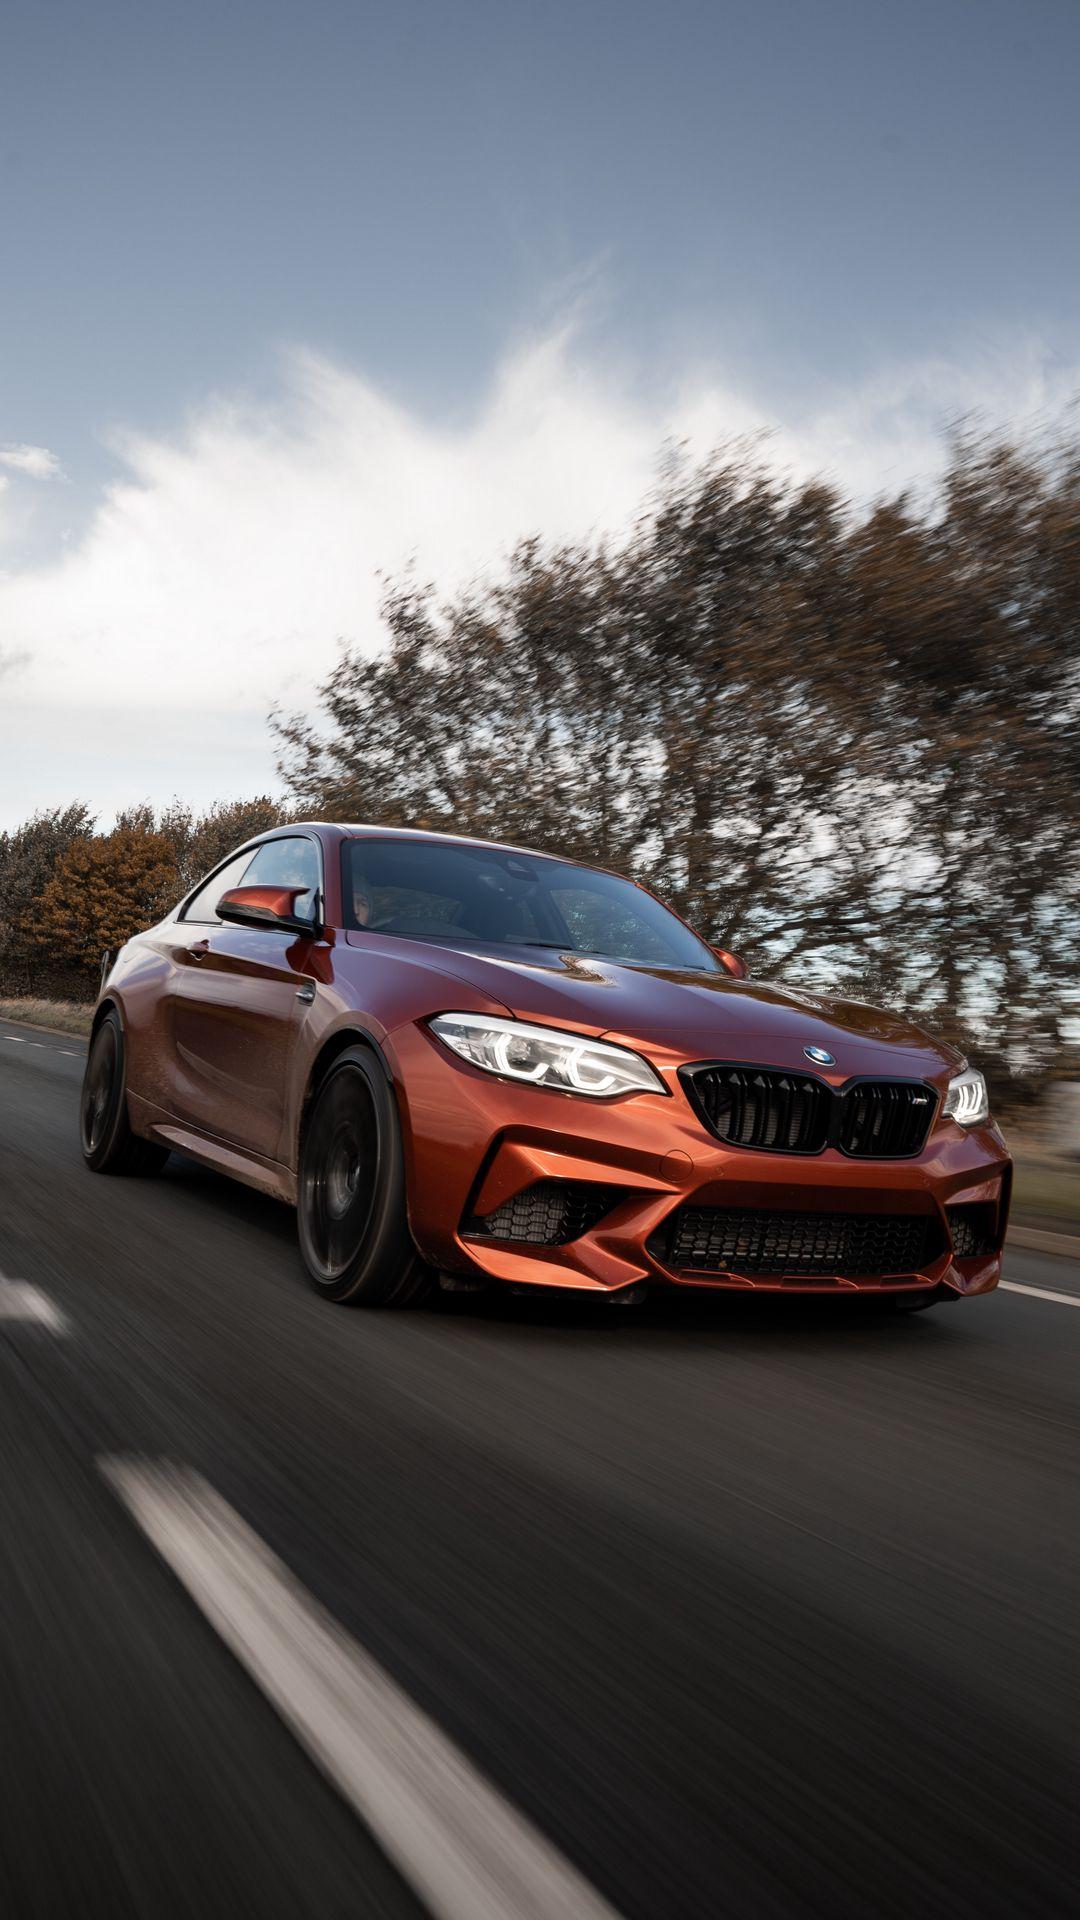 BMW M2 Series Gold Car Wallpapers Free Download